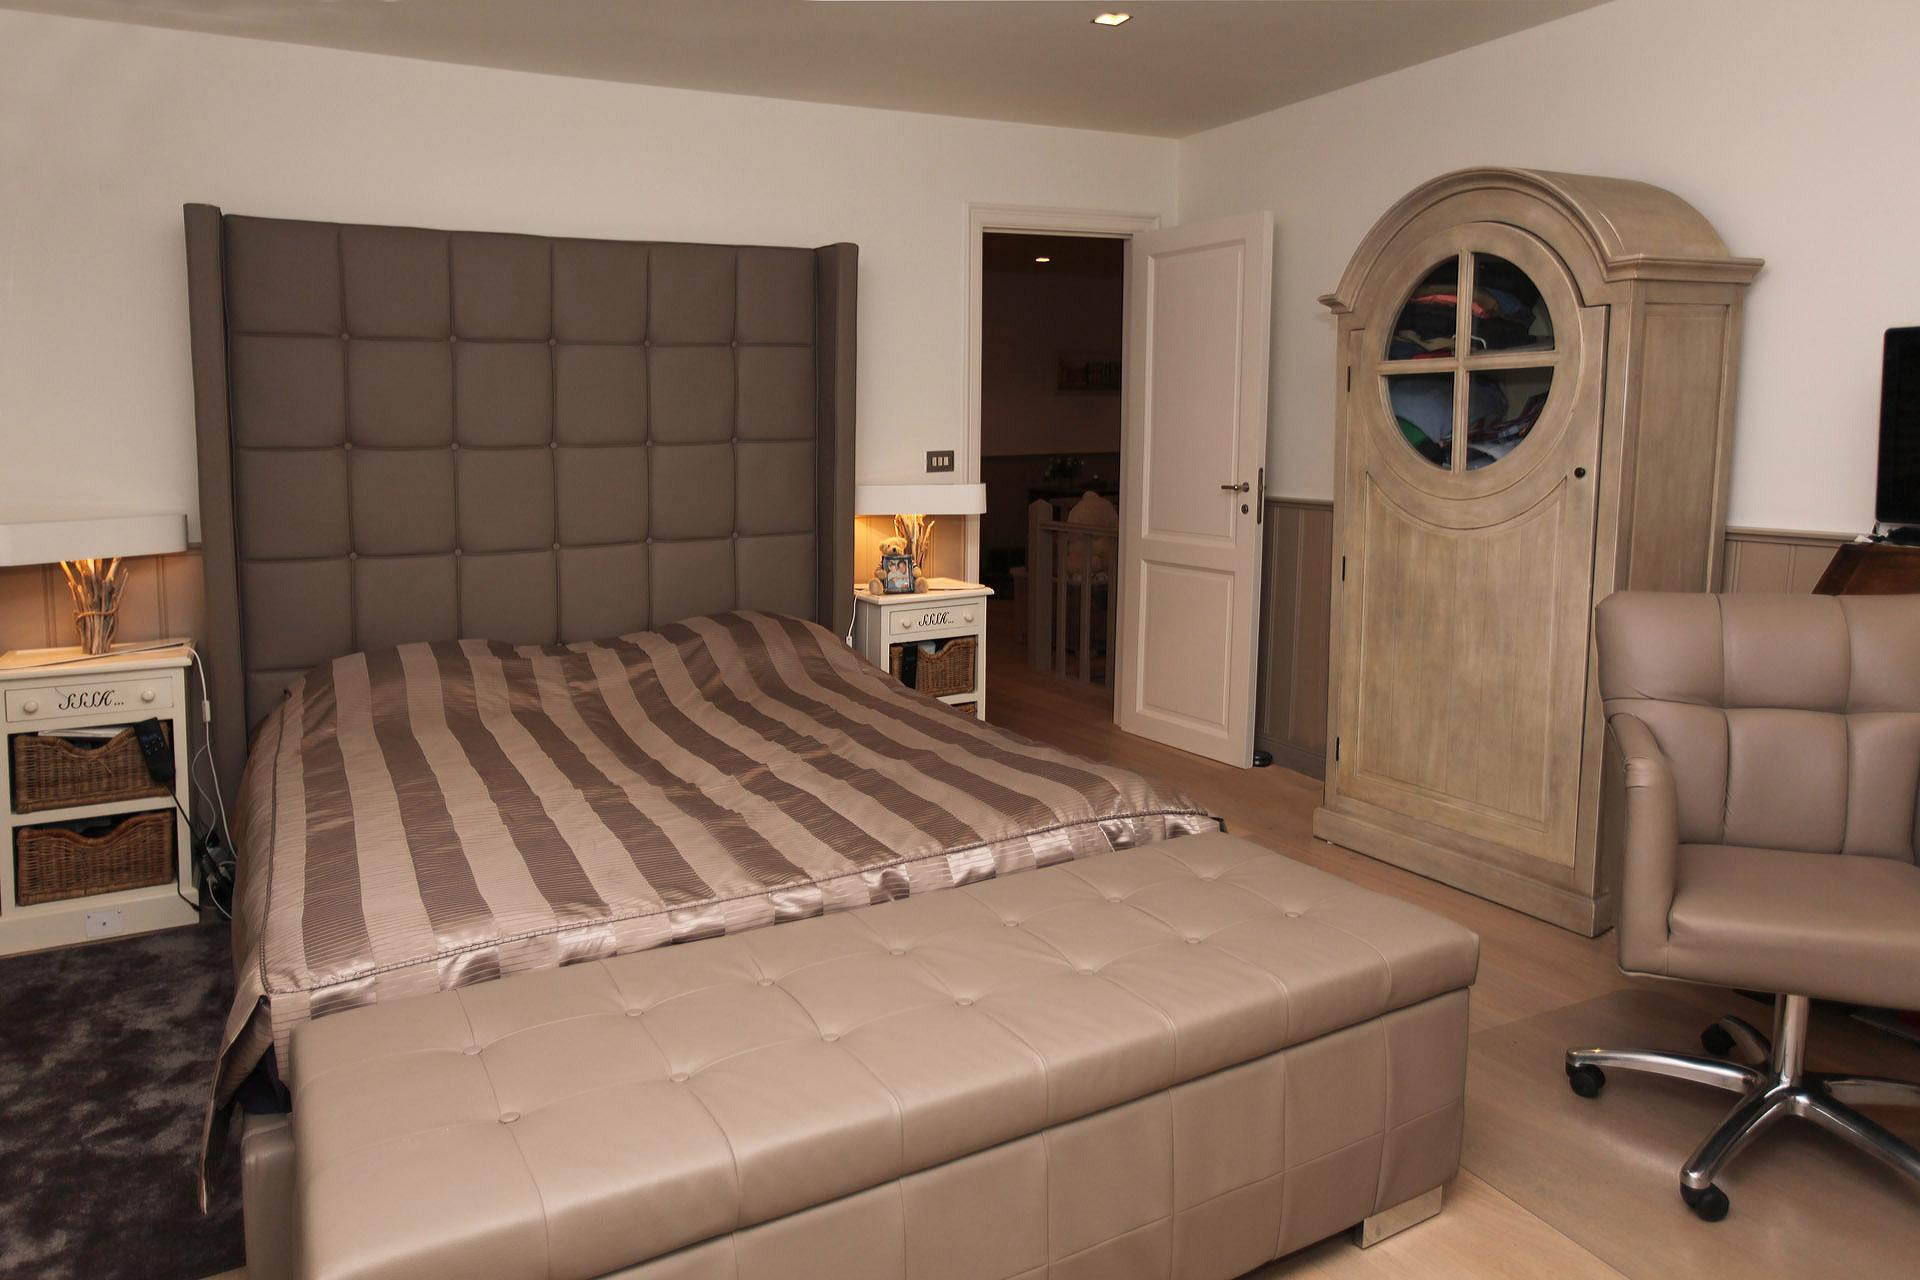 Intérieur cottage campagnard - Marcotte Style